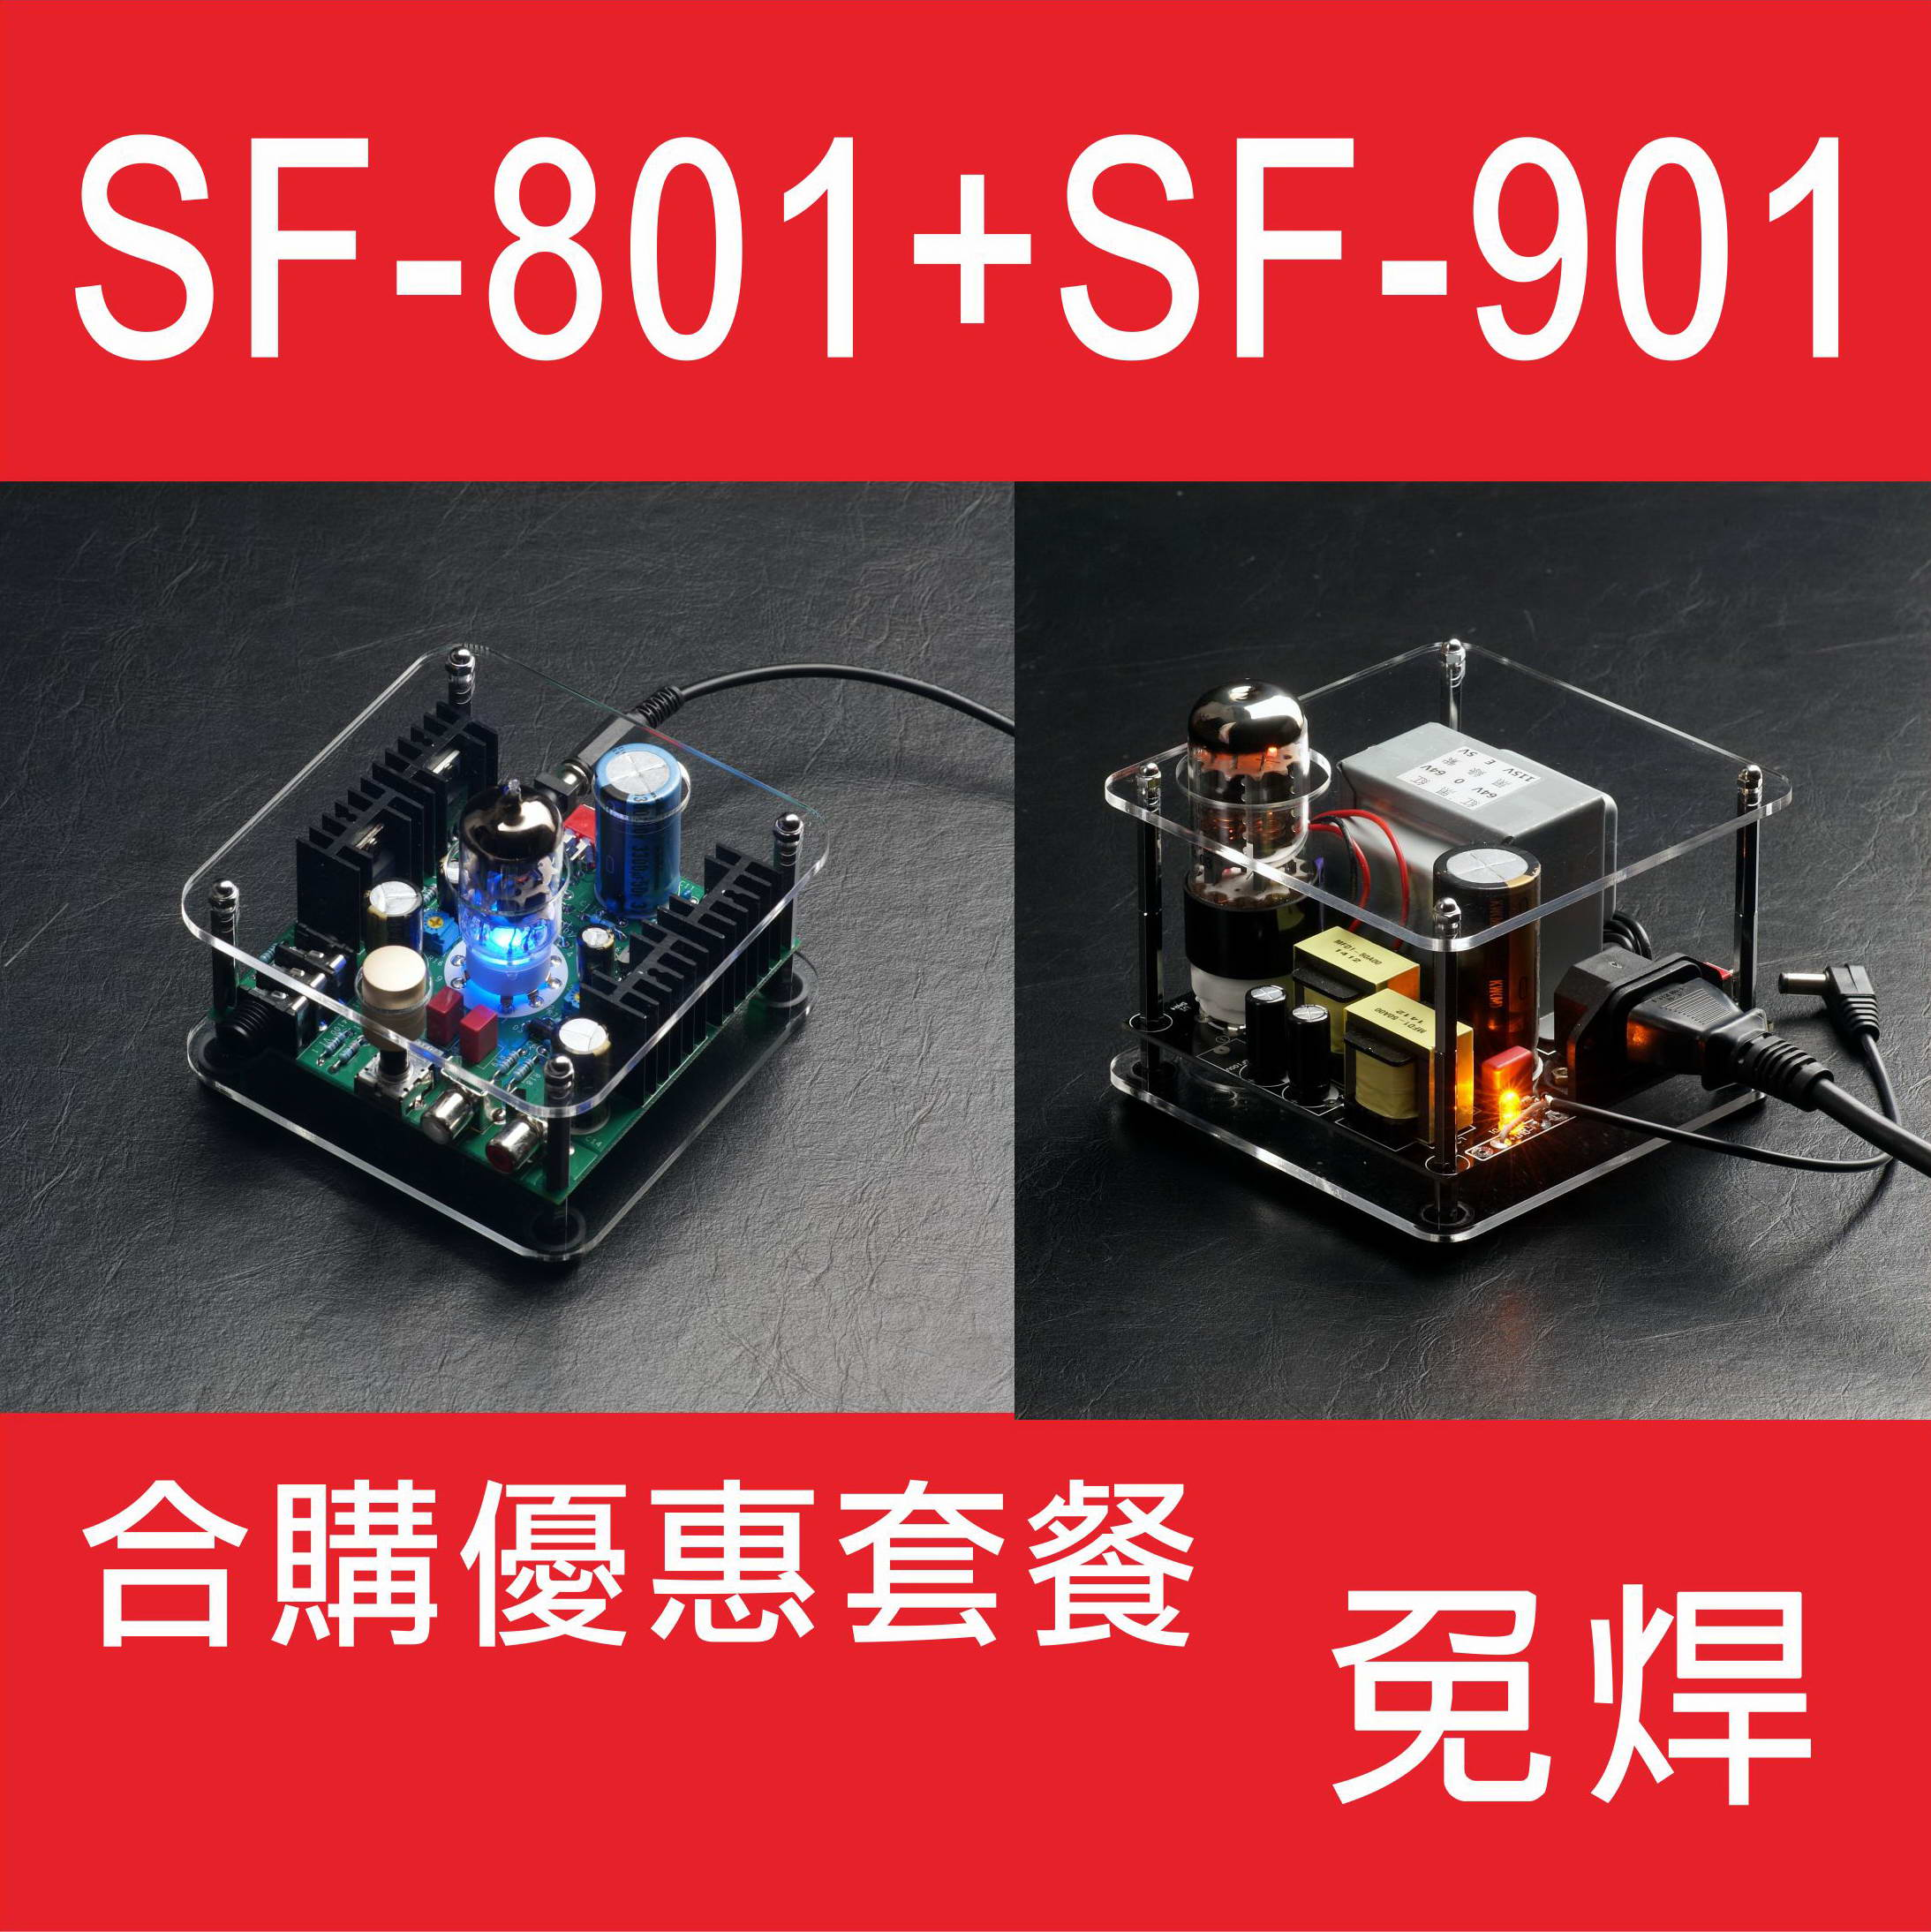 SF-801+SF-901合購優惠套餐免焊版